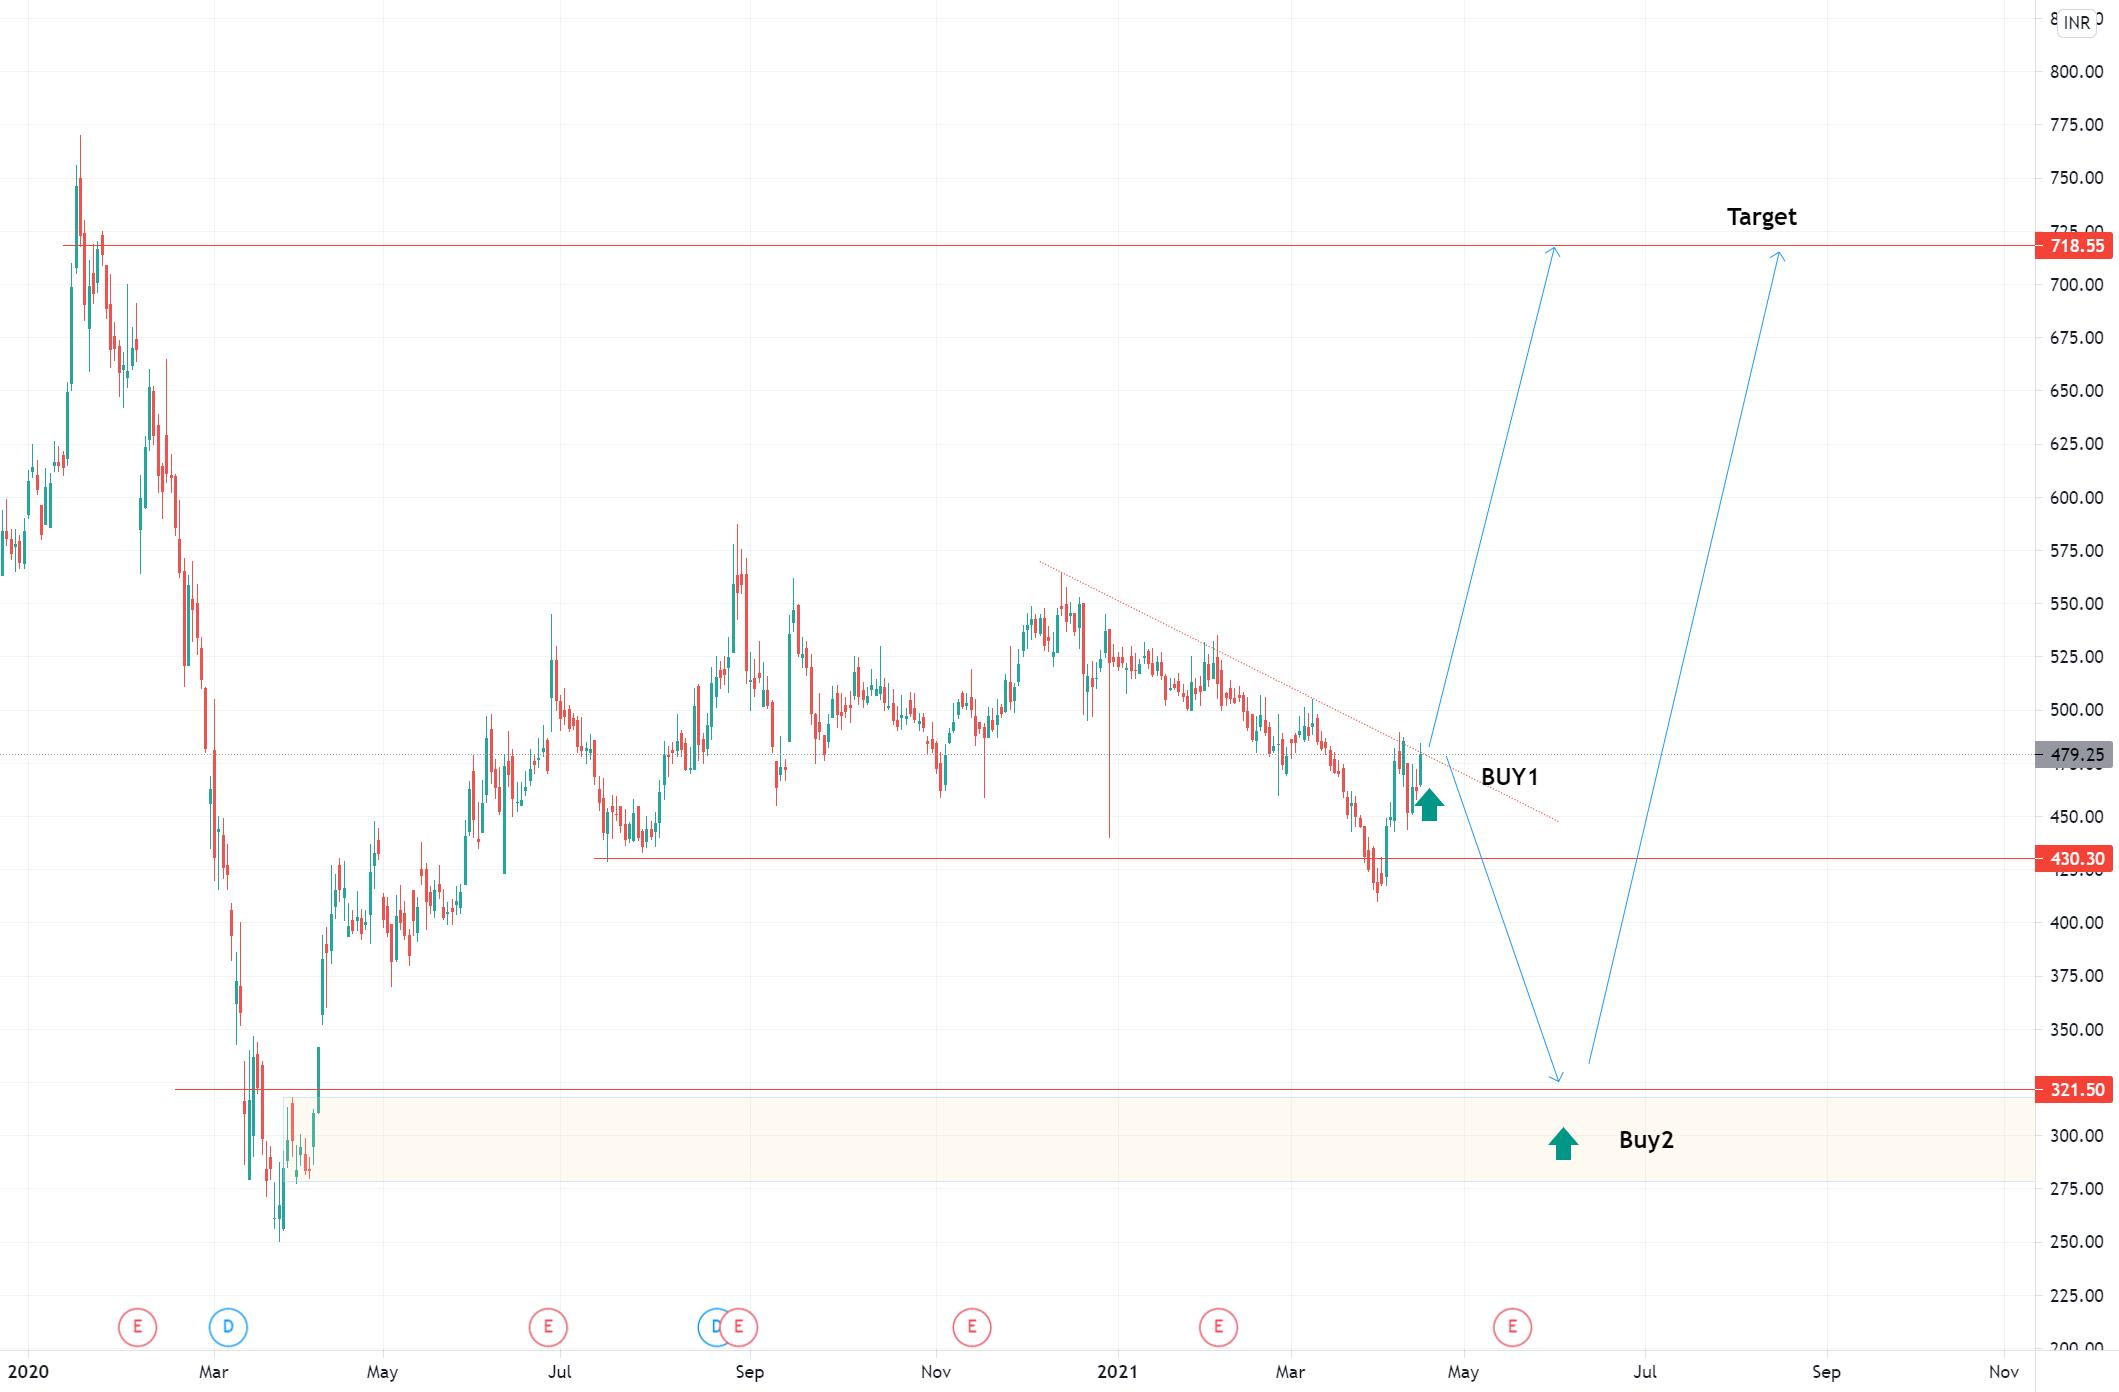 Live Challenging Market Analysis Buy AVANTIFEED @ 479.25